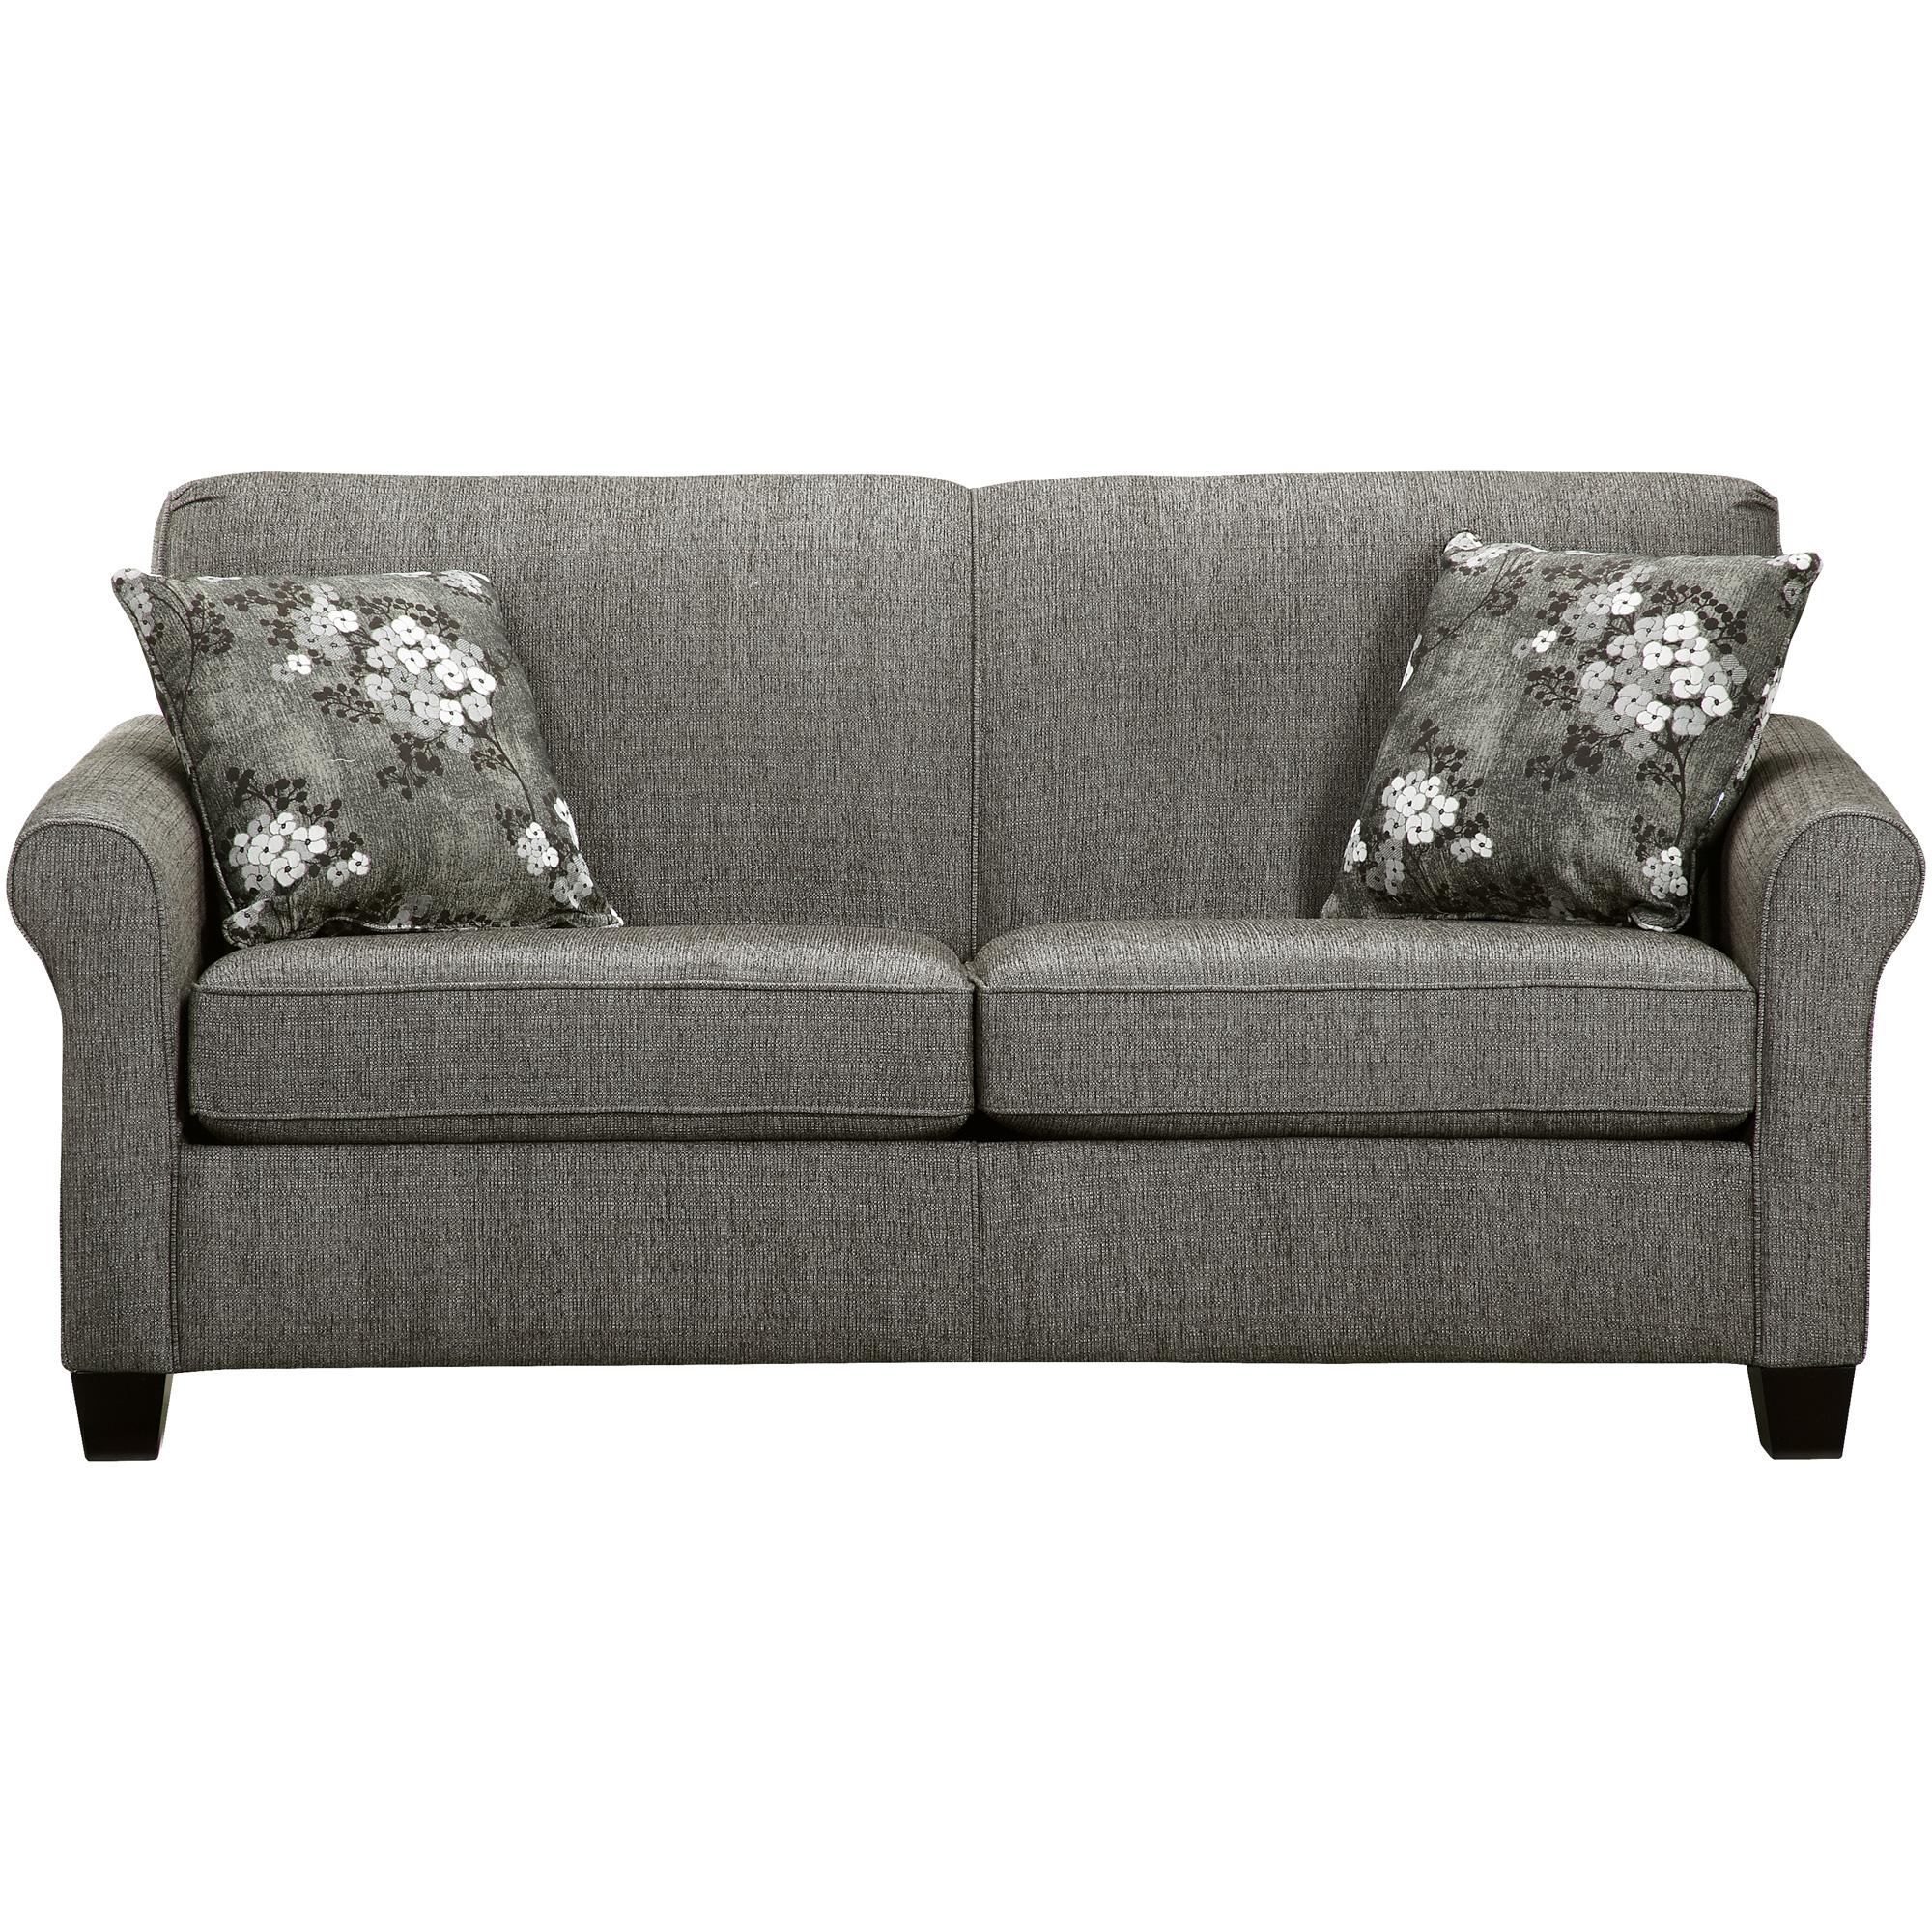 Dimensions By England | York Granite Full Visco Sleeper Sofa